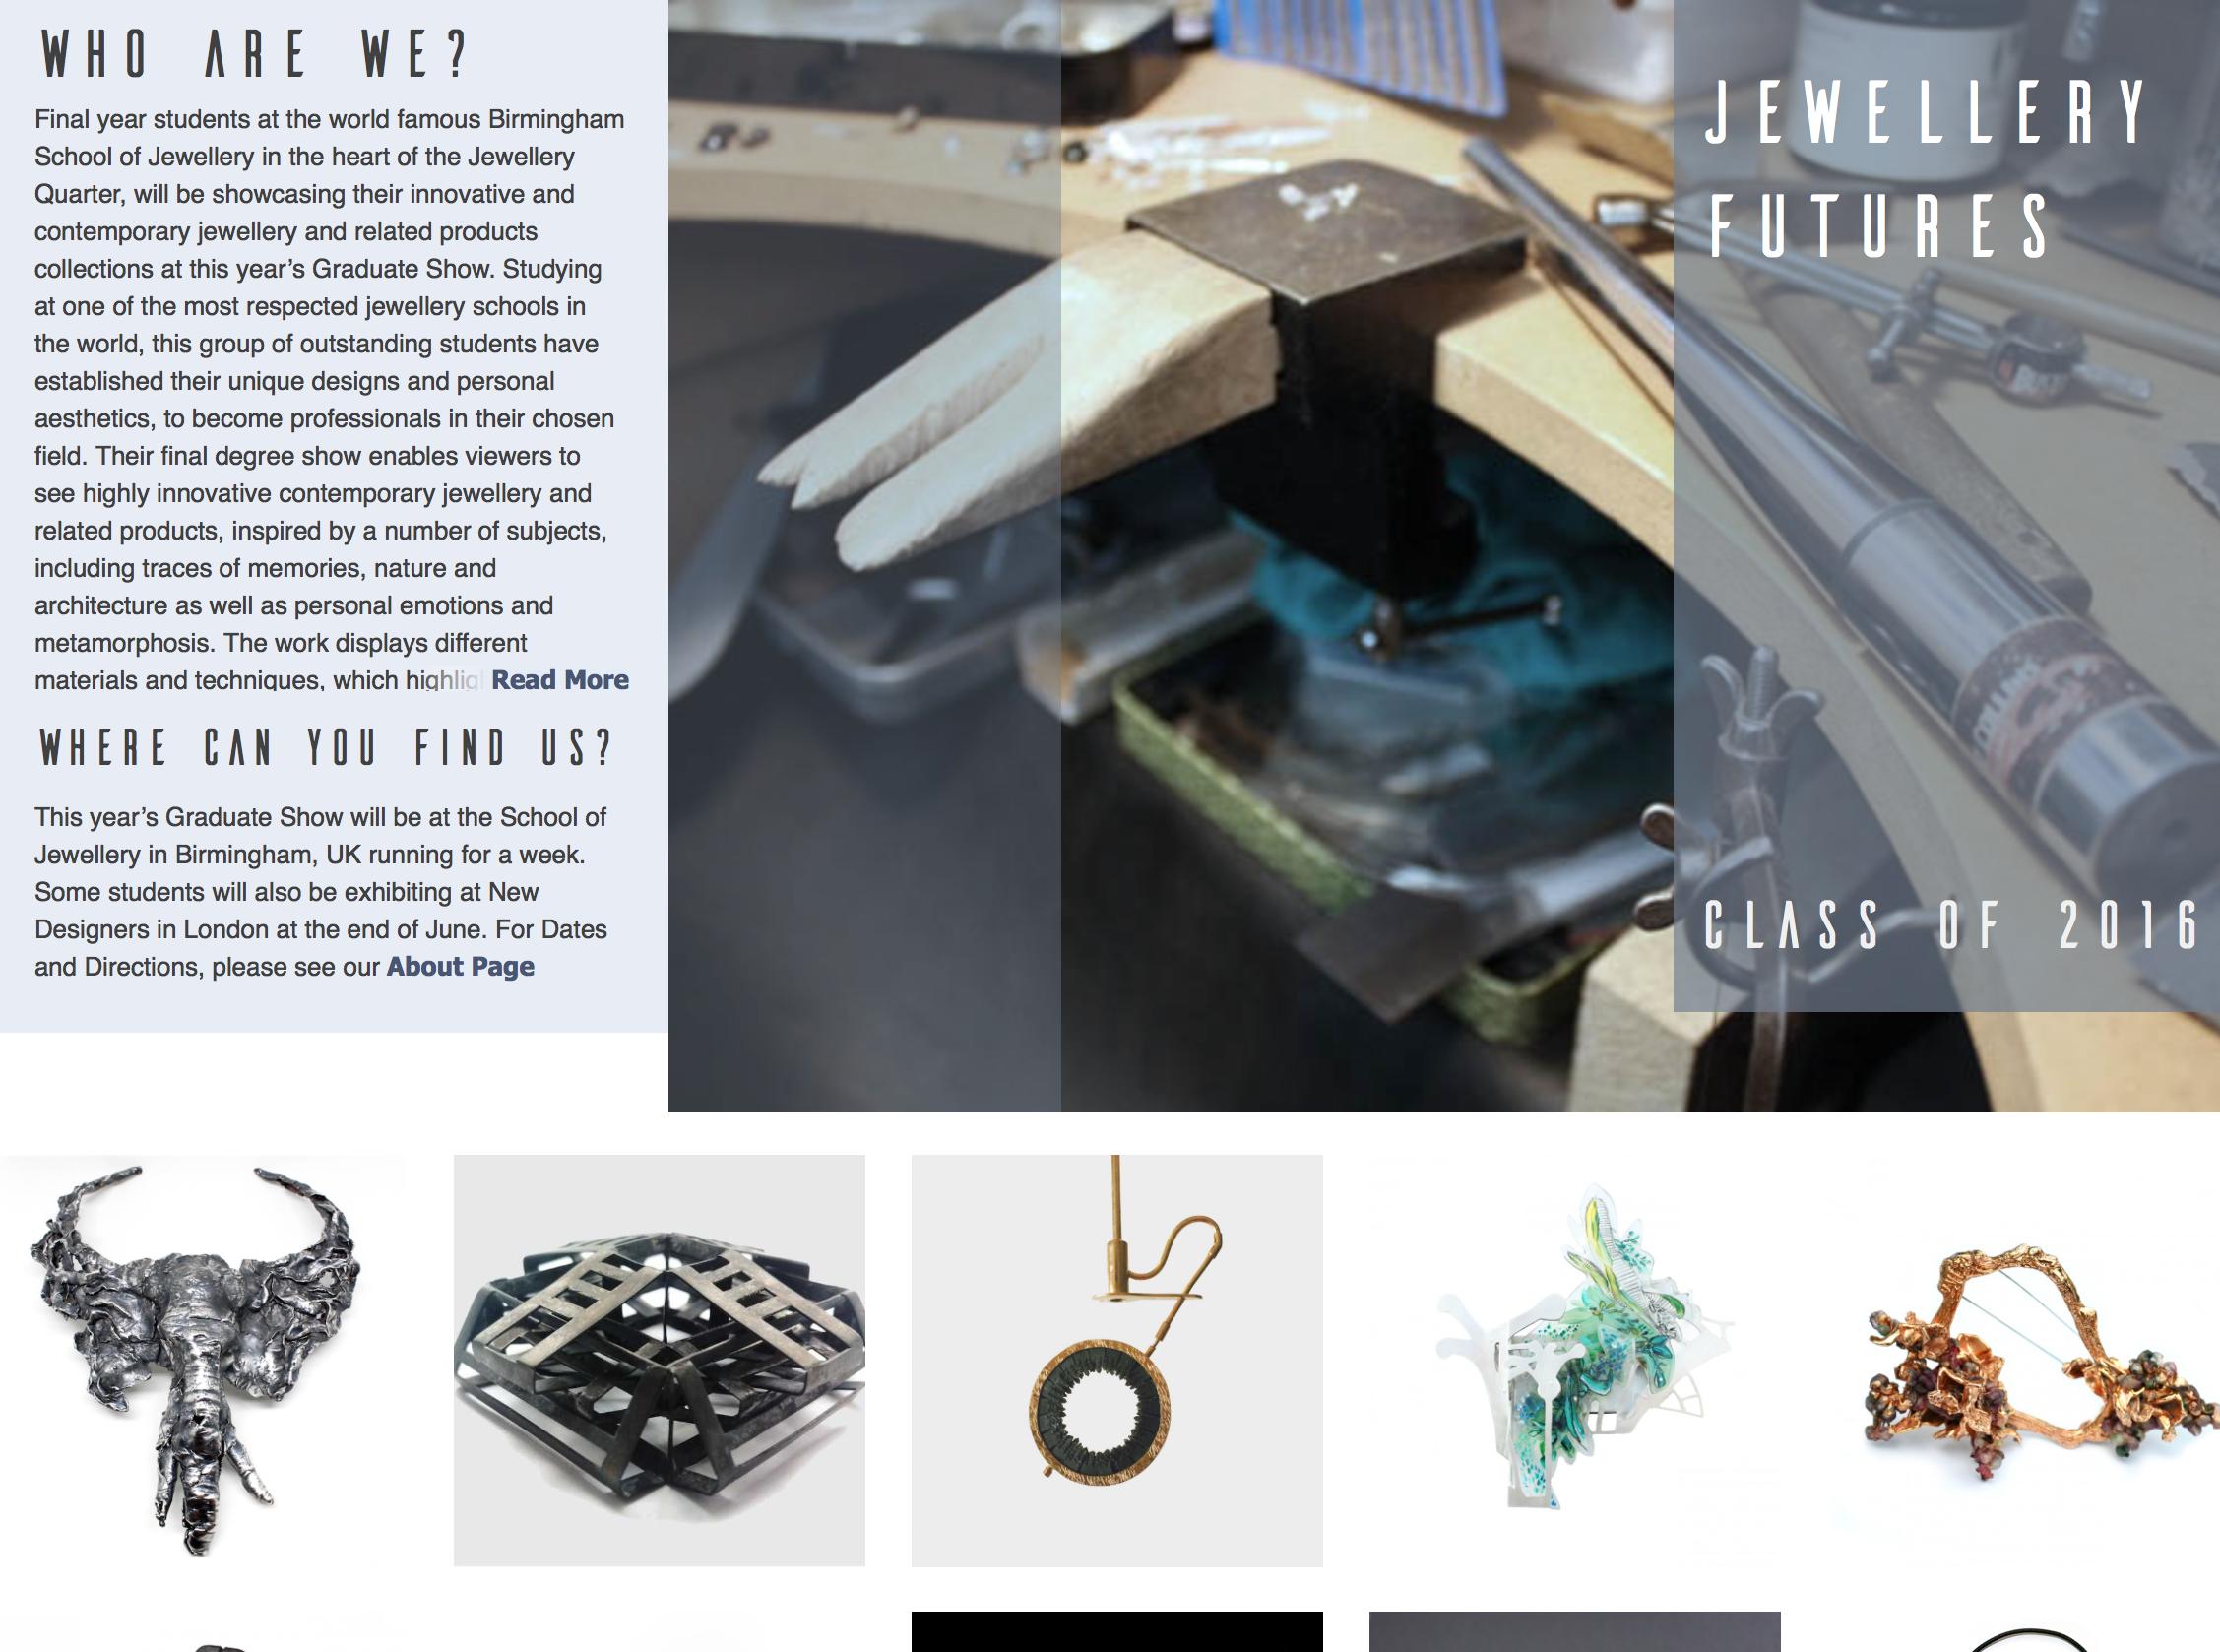 the jewellery futures